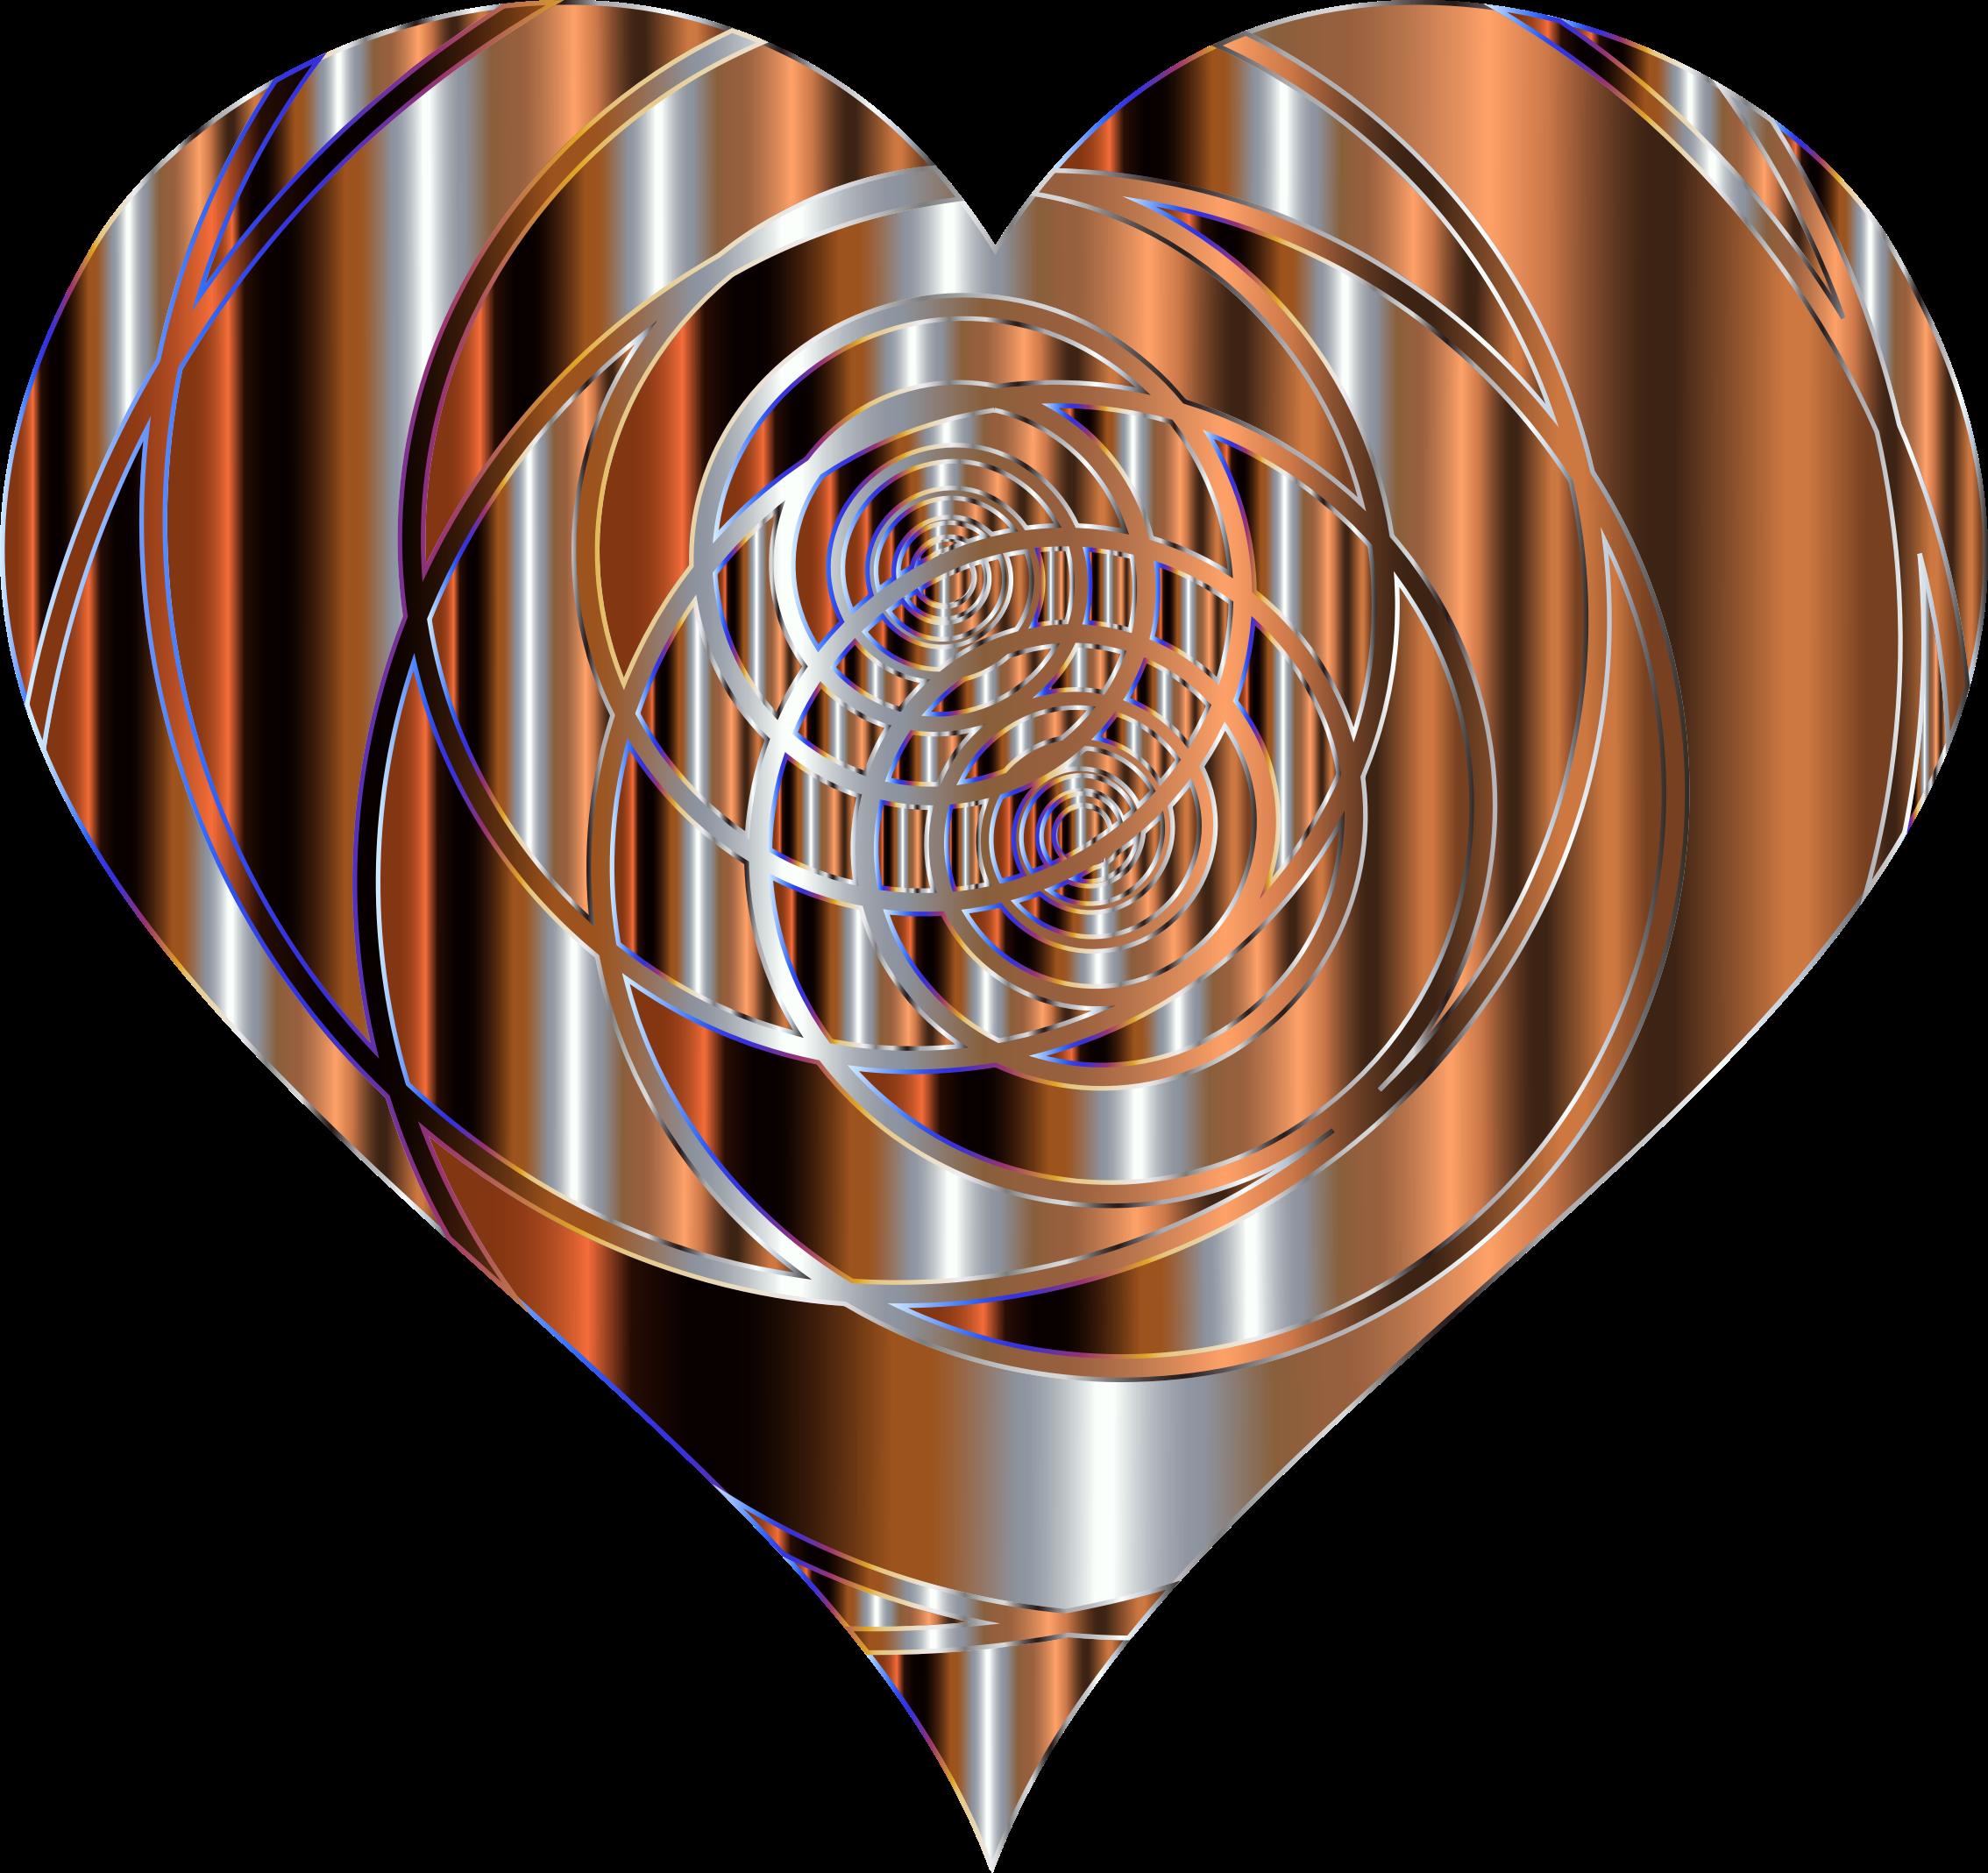 Clipart - Spiral Heart 12 Variation 2